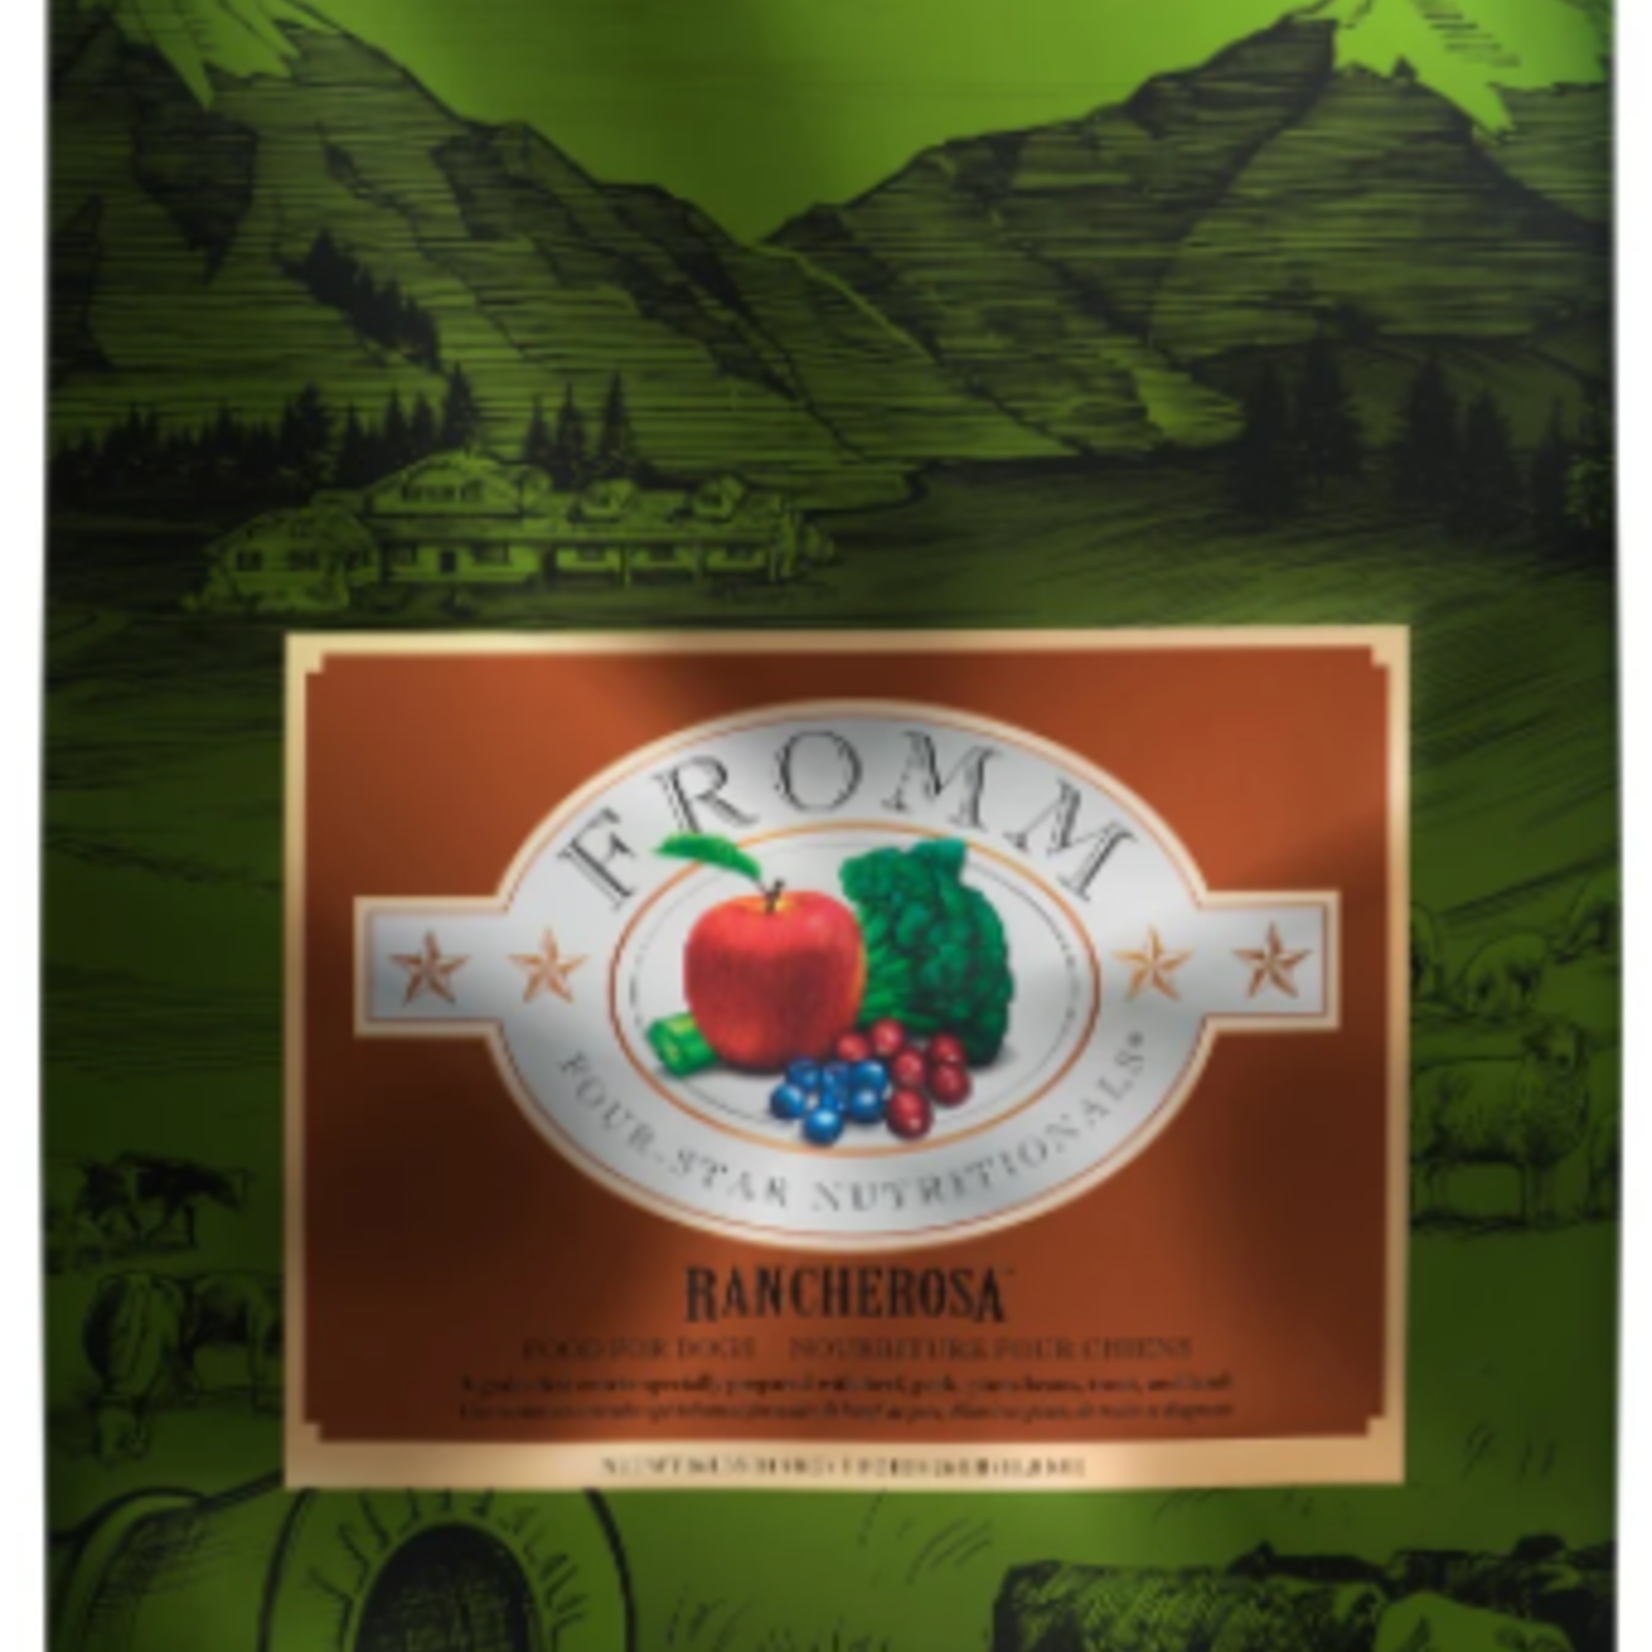 Fromm Rancherosa® - dog dry food